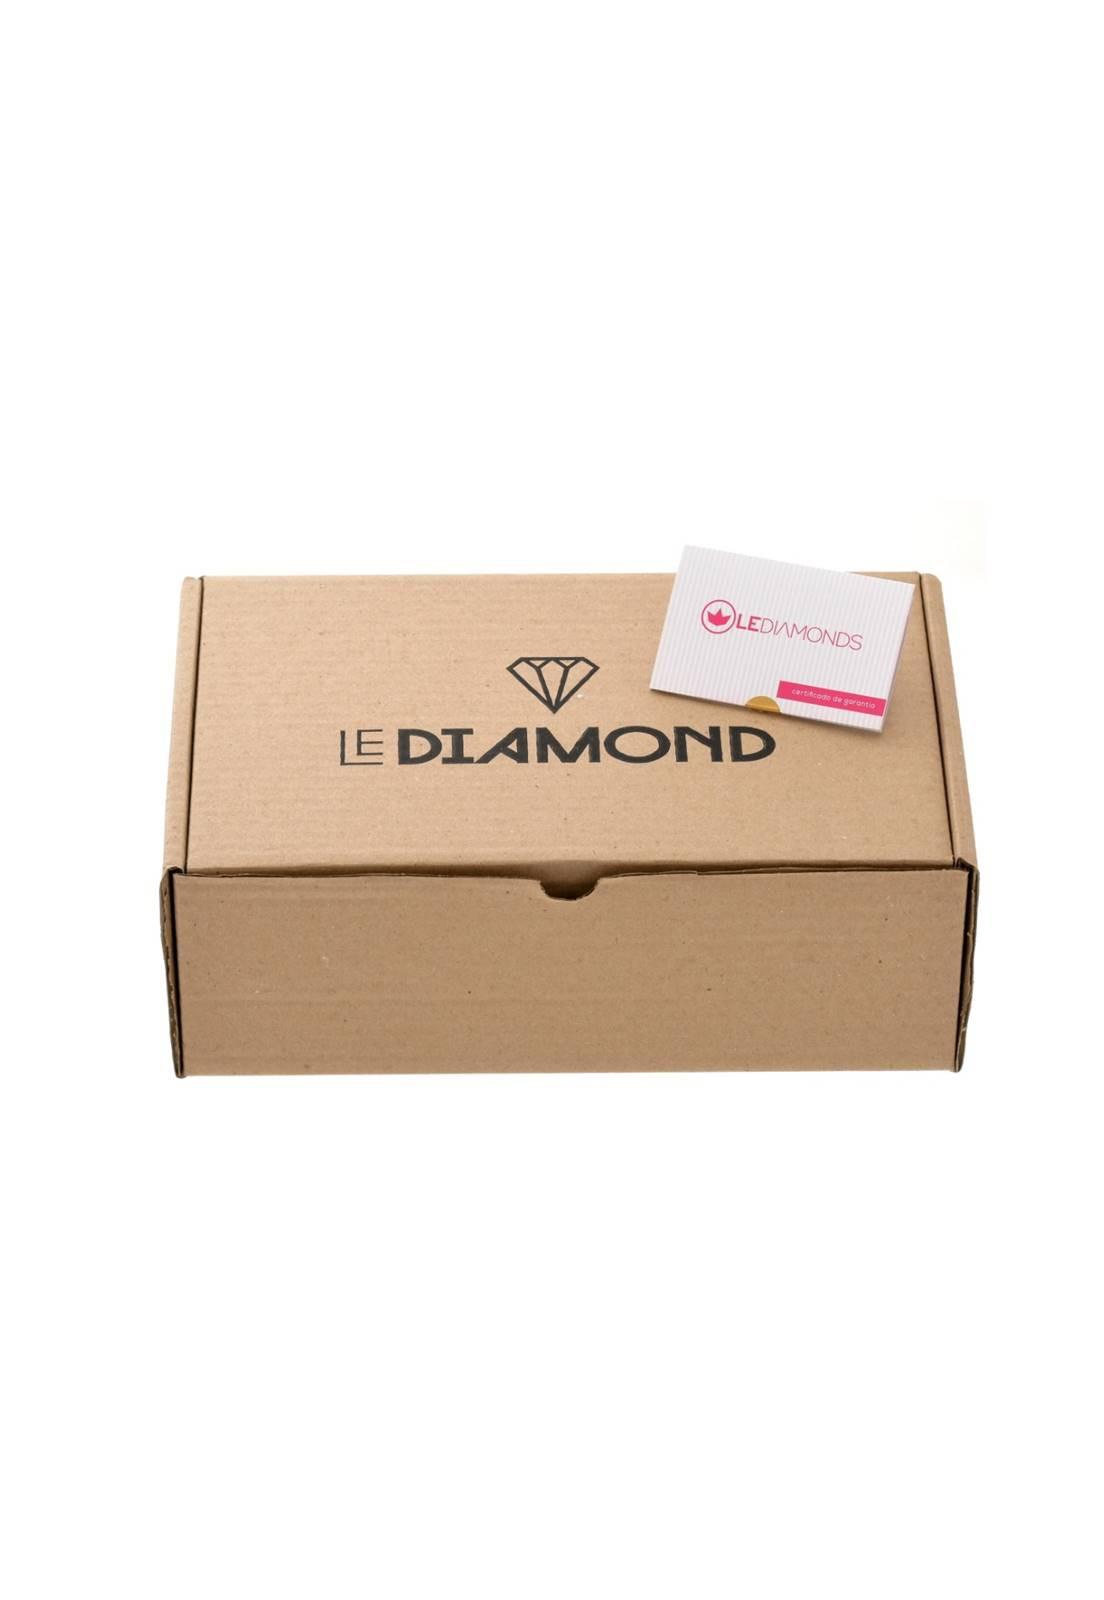 Brinco Le Diamond Chapa Mandala e Listras Dourado